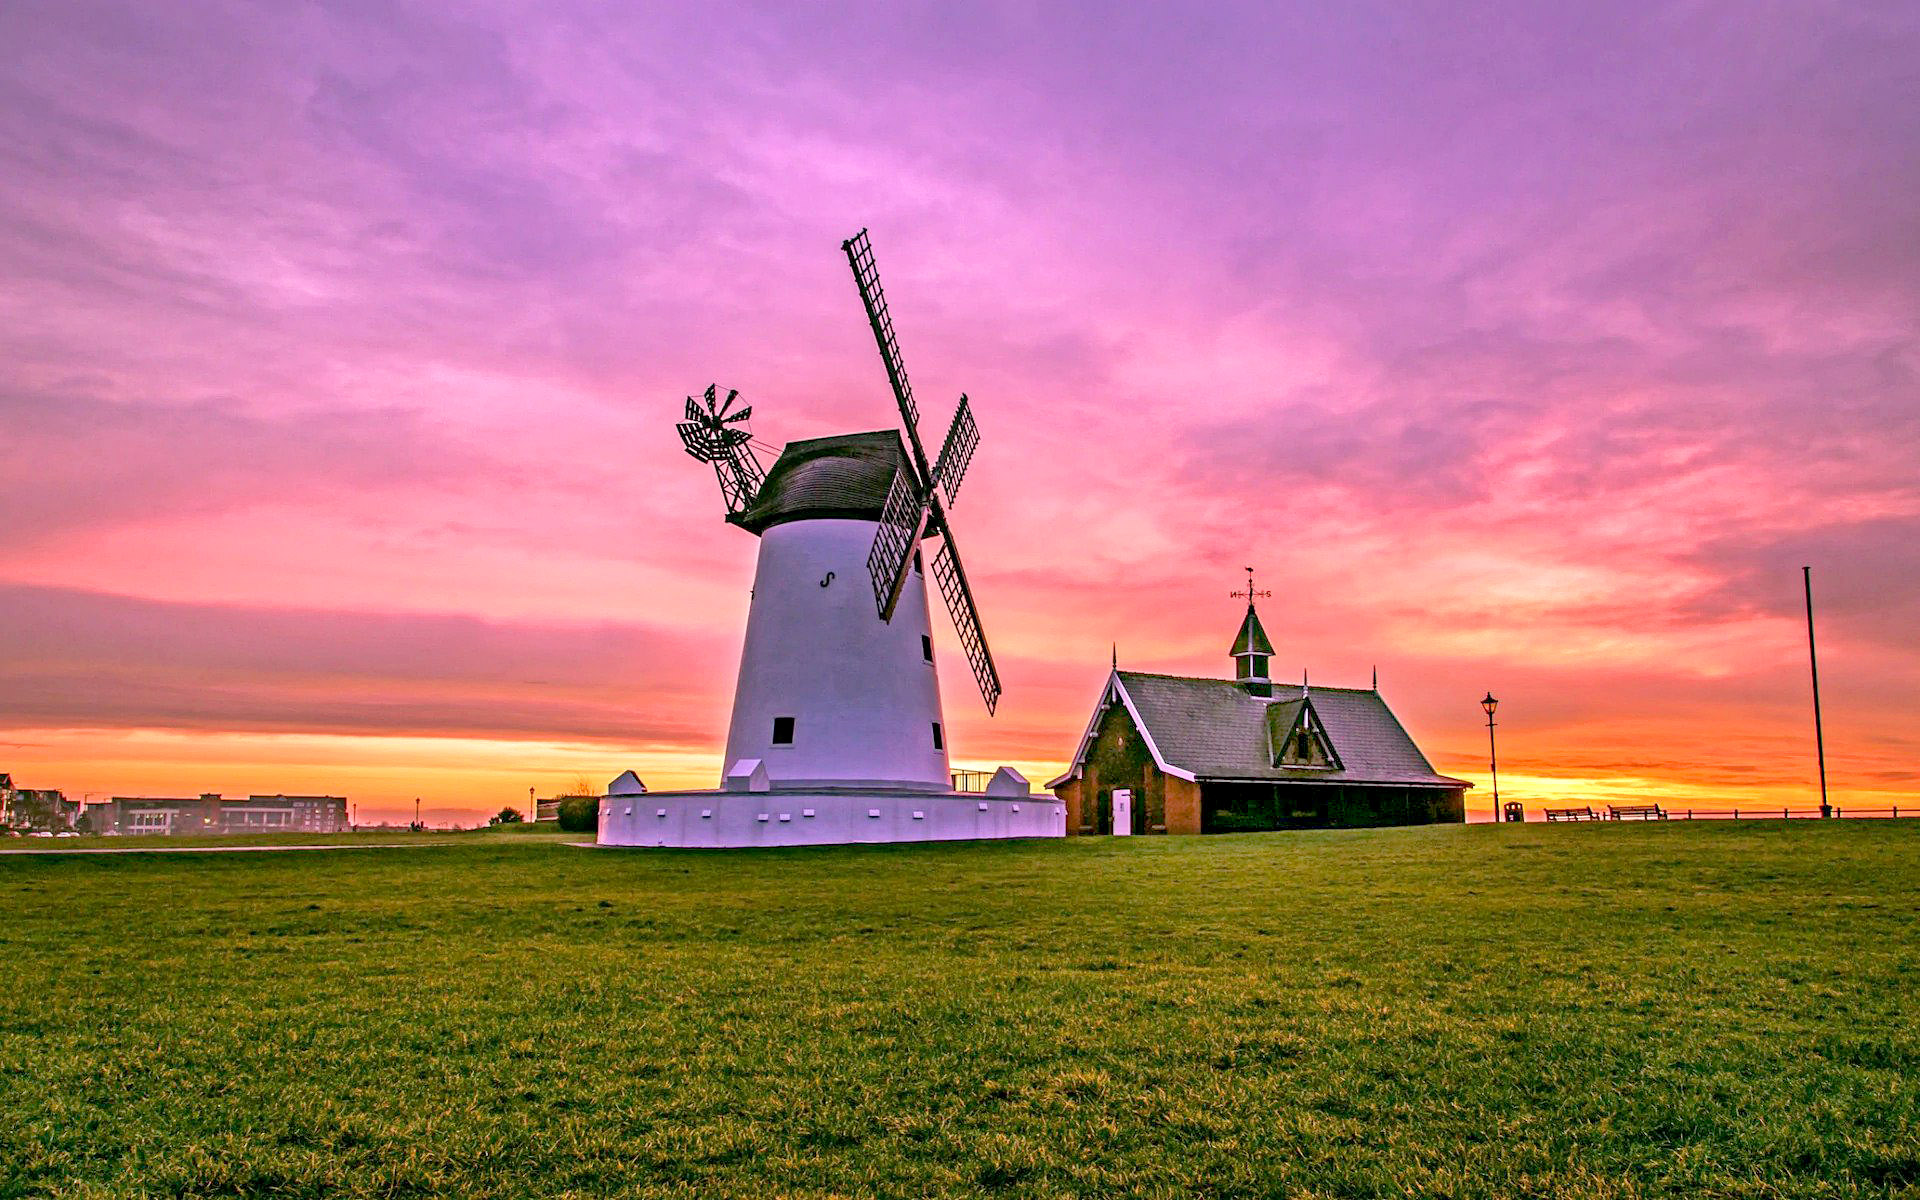 Sunrise over the windmill in Lytham St Annes, Lancashire by Gregg Wolstenholme.jpg